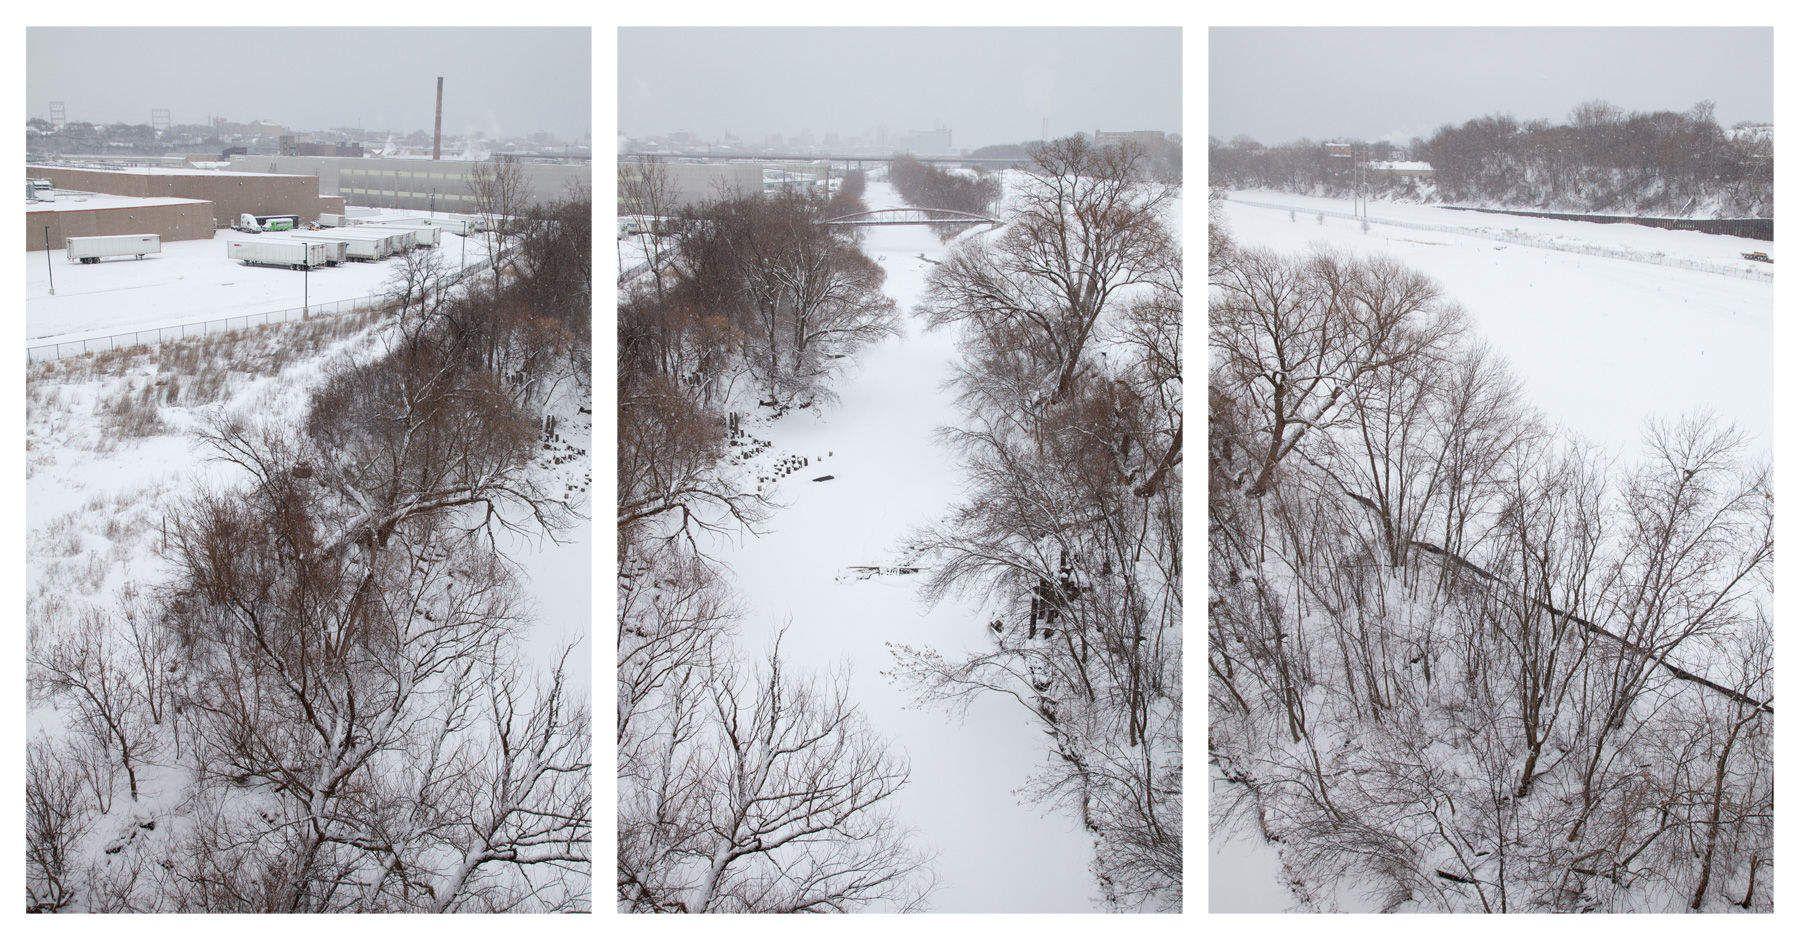 Winter: Menomonee River